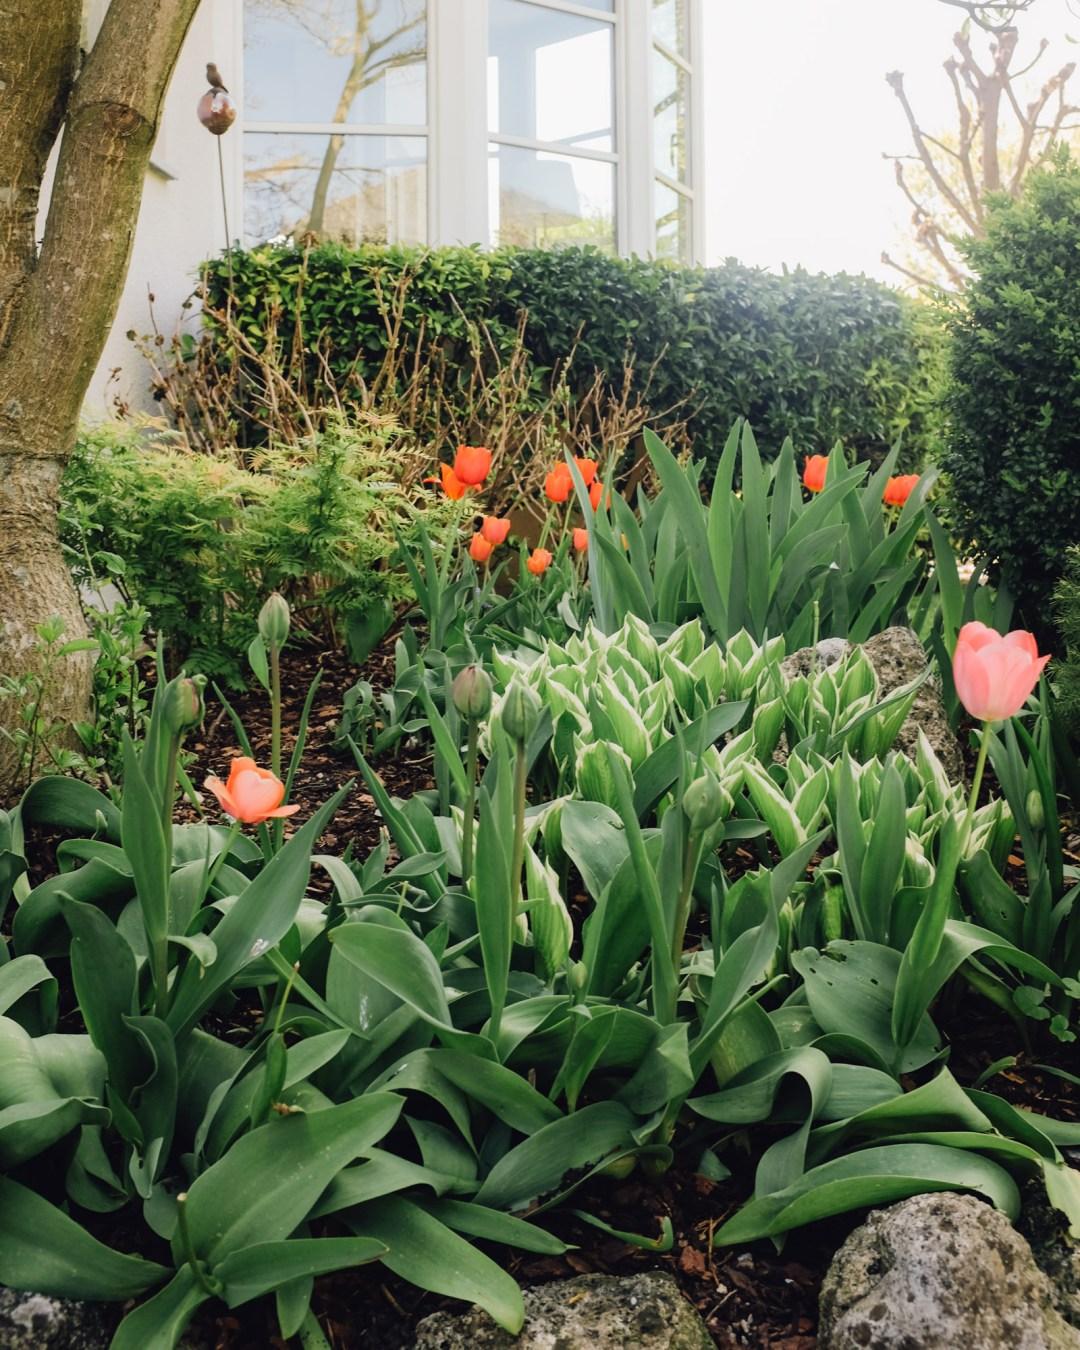 Inastil, Frühling2020, Raumduft, Raumspray, Wäschespray, Zirbenlüfter, Garten, Frühlingsgarten, Tulpen, Gärtner, Gartentipps, Ü50Blogger, Gartenliebe-9